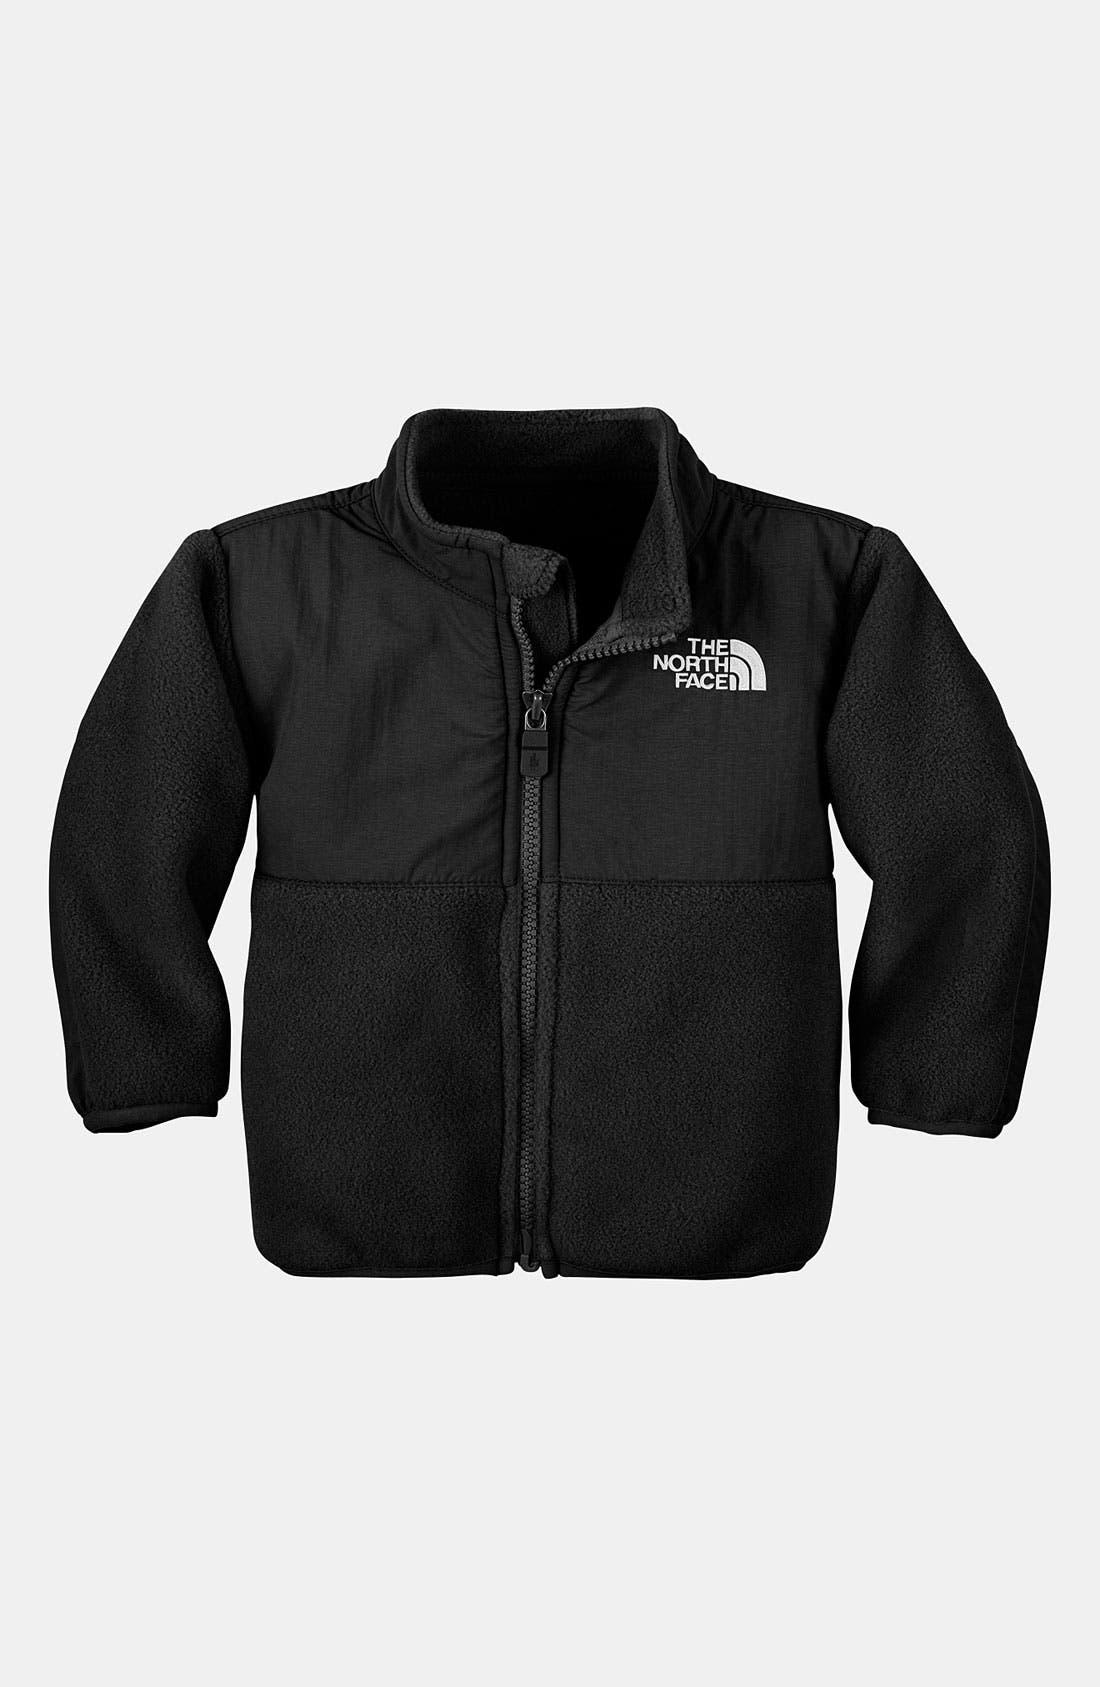 Main Image - The North Face 'Denali' Recycled Fleece Jacket (Baby Boys)